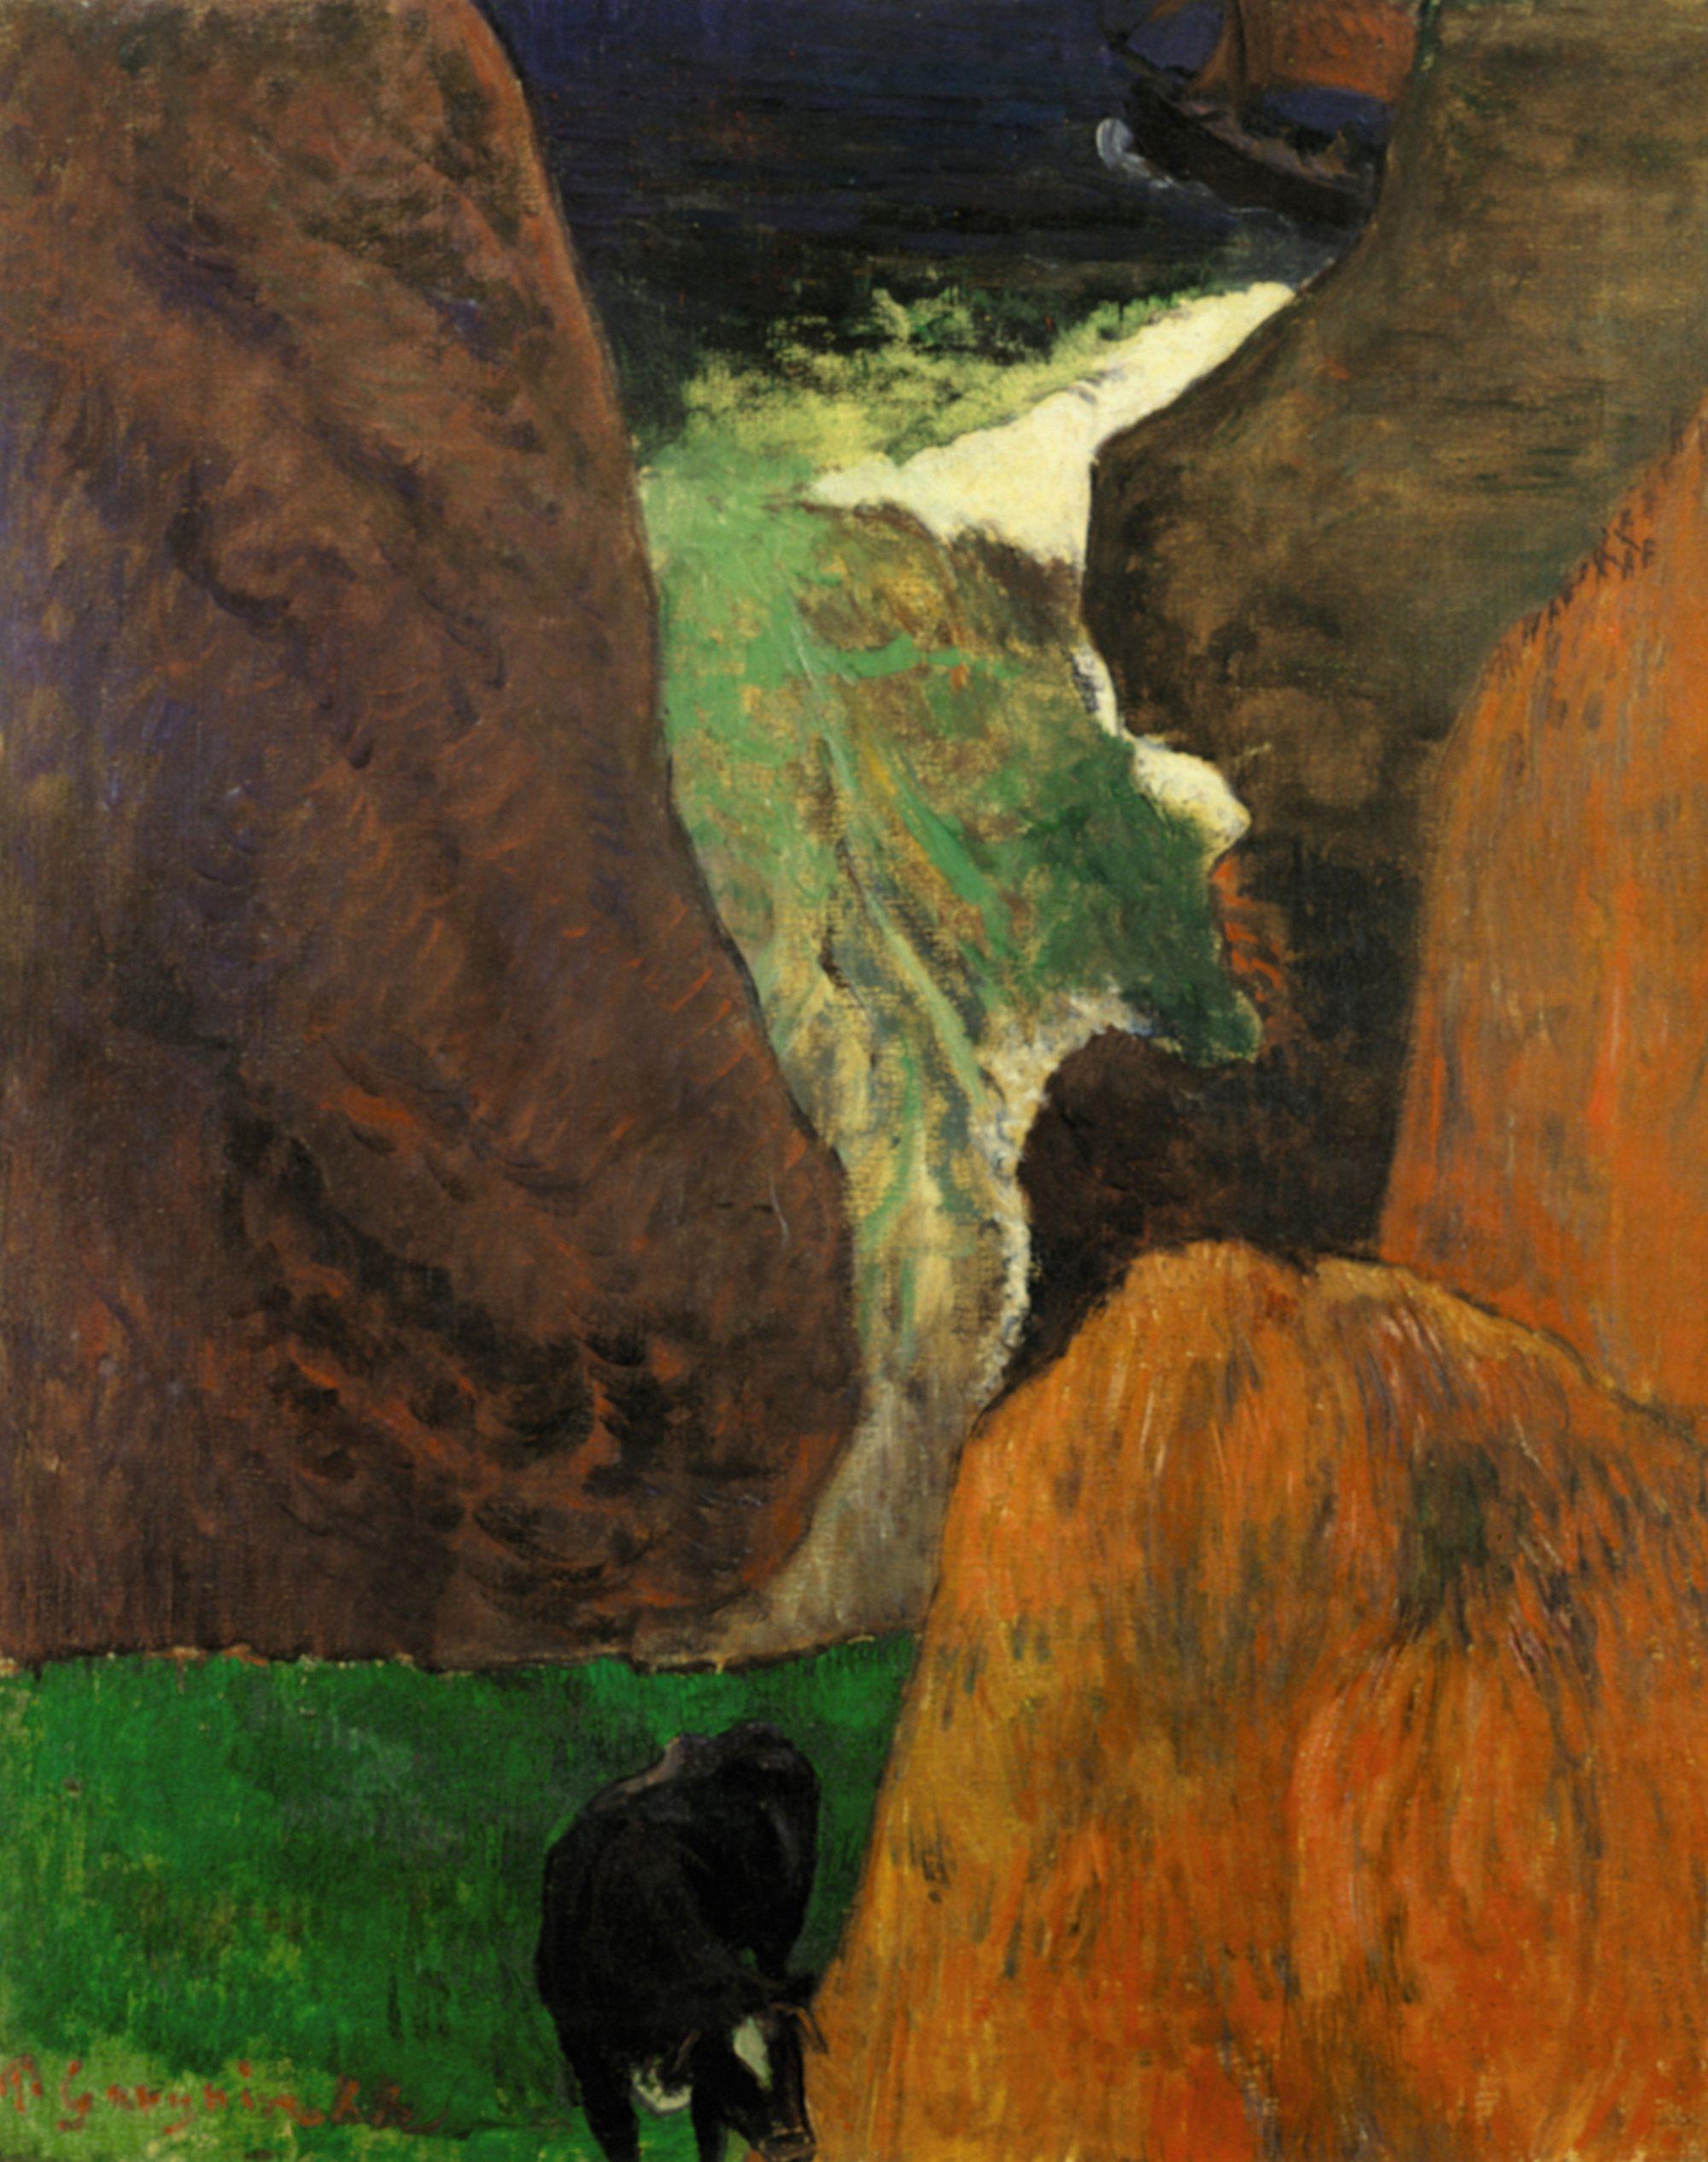 ������� ������ � ������� �� ���� ����� :: ���� �����, �������, ���� ������ ��� ������� - ����� ���� ( Paul Gauguin ) ����